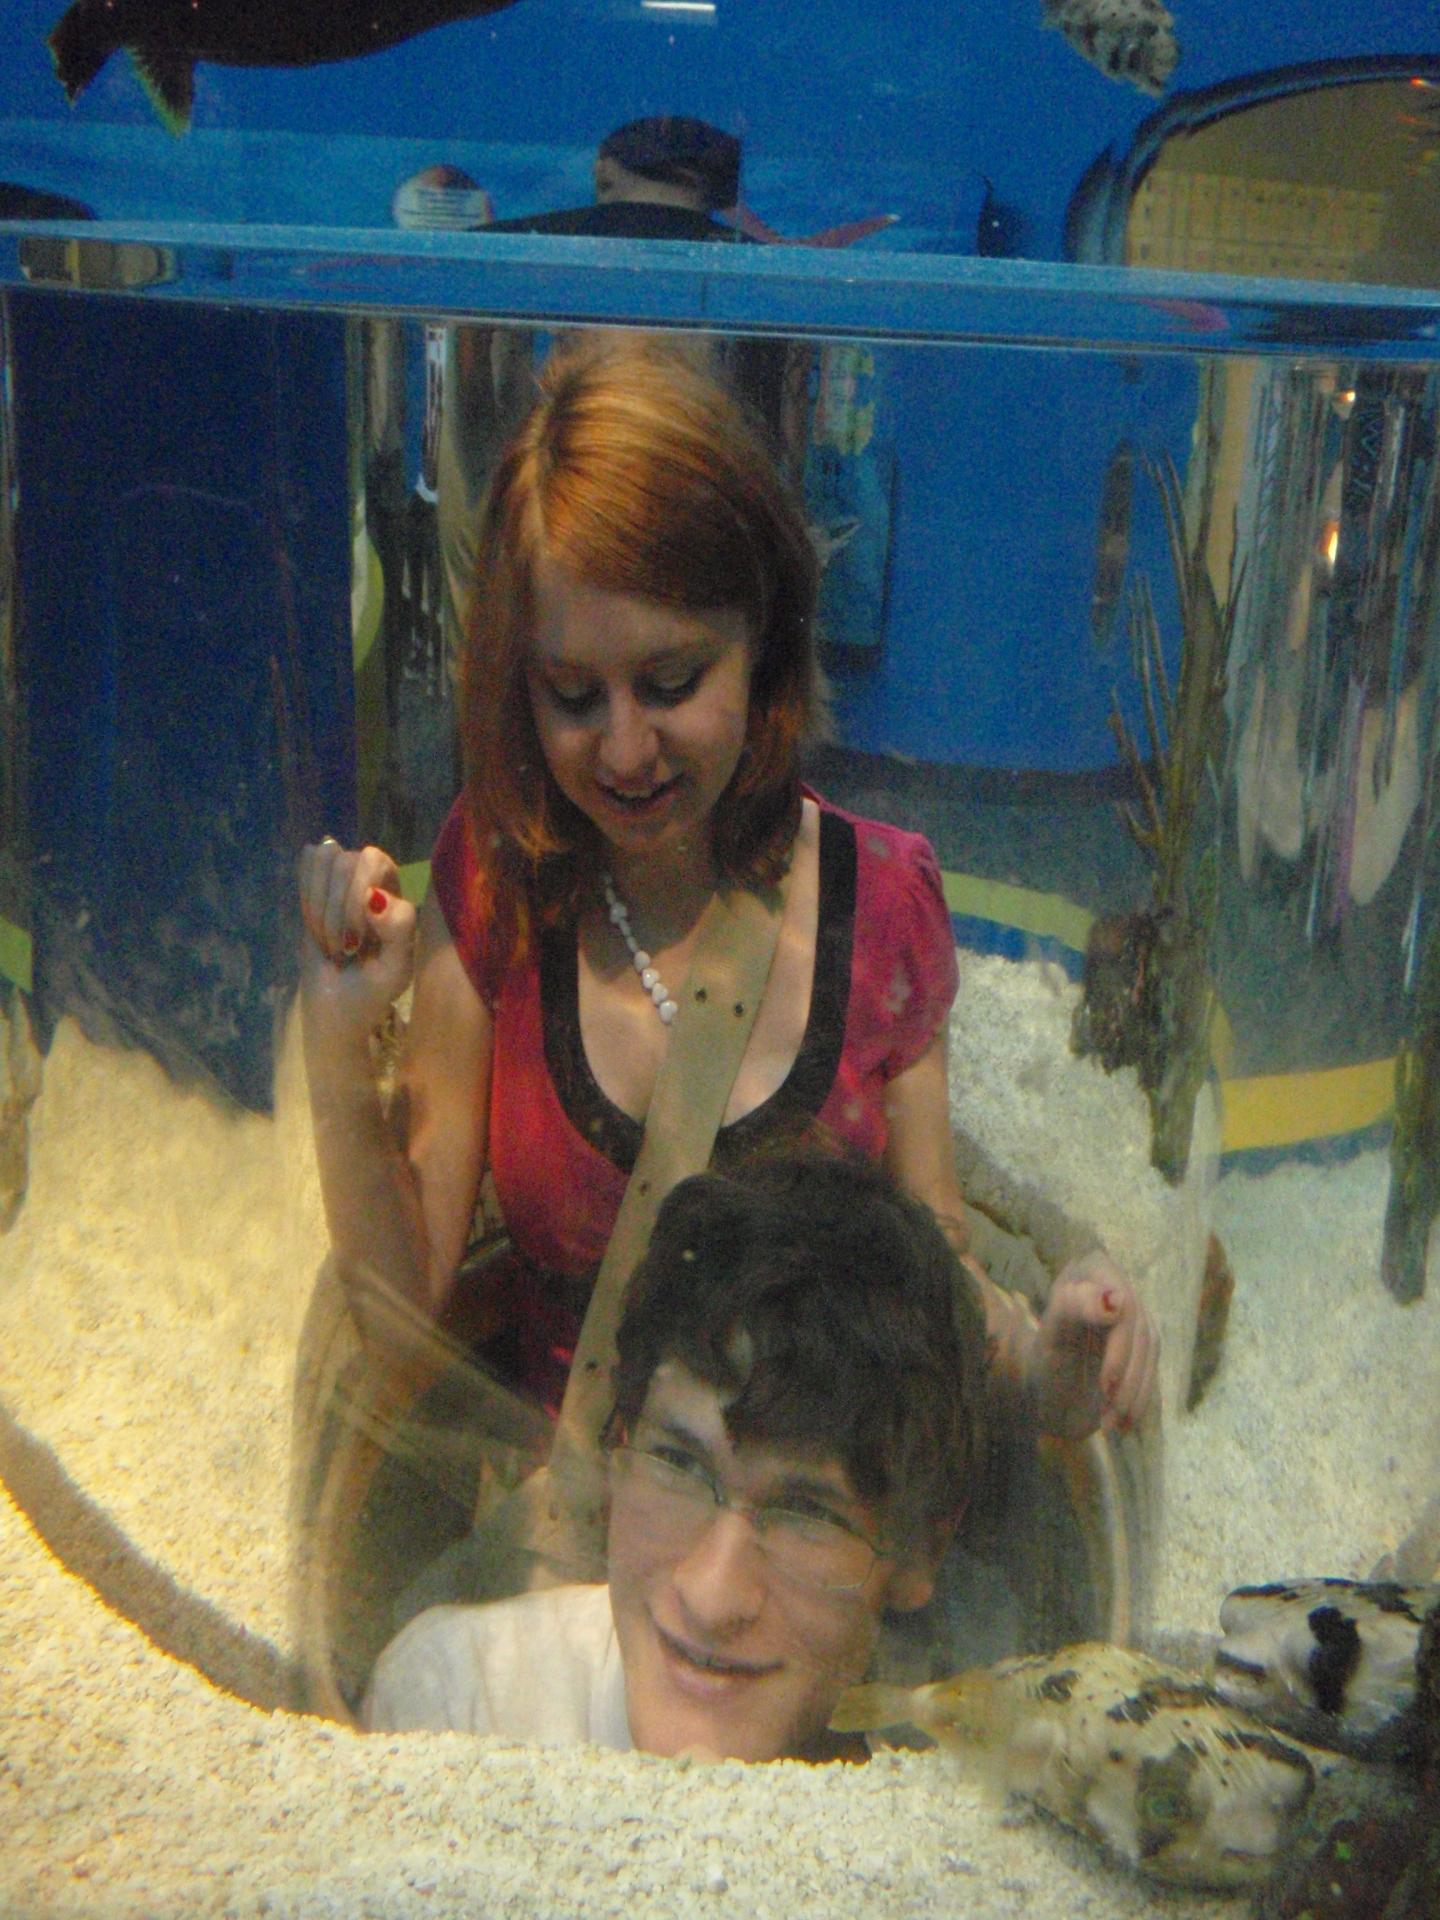 2008 - Ripley's Aquarium, TN